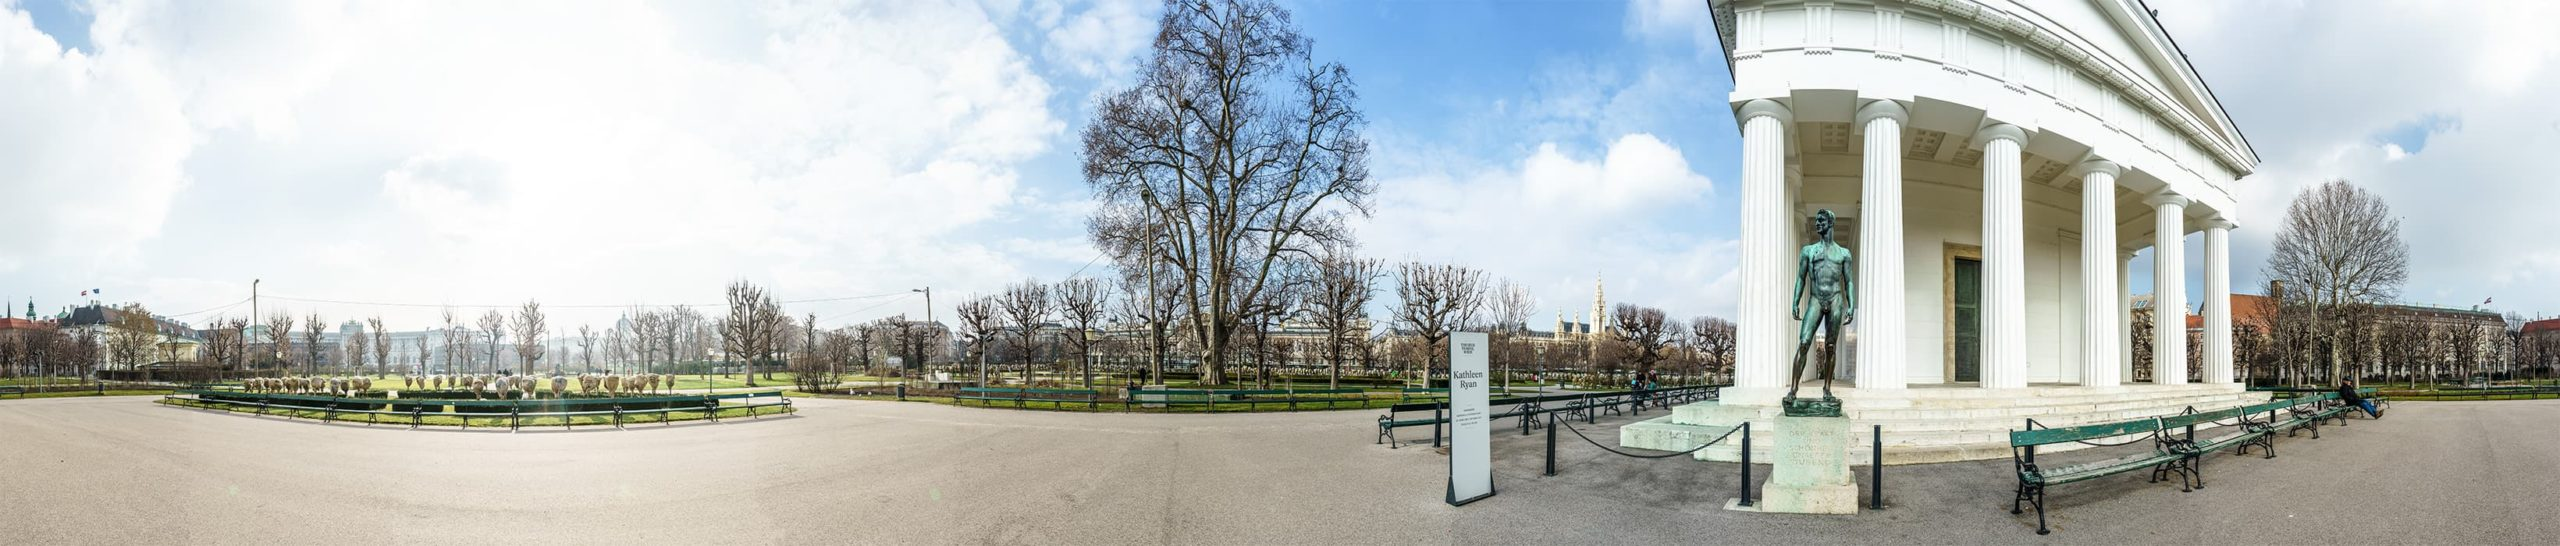 Wien Panorama Volksgarten 13 Wienkulturinfo